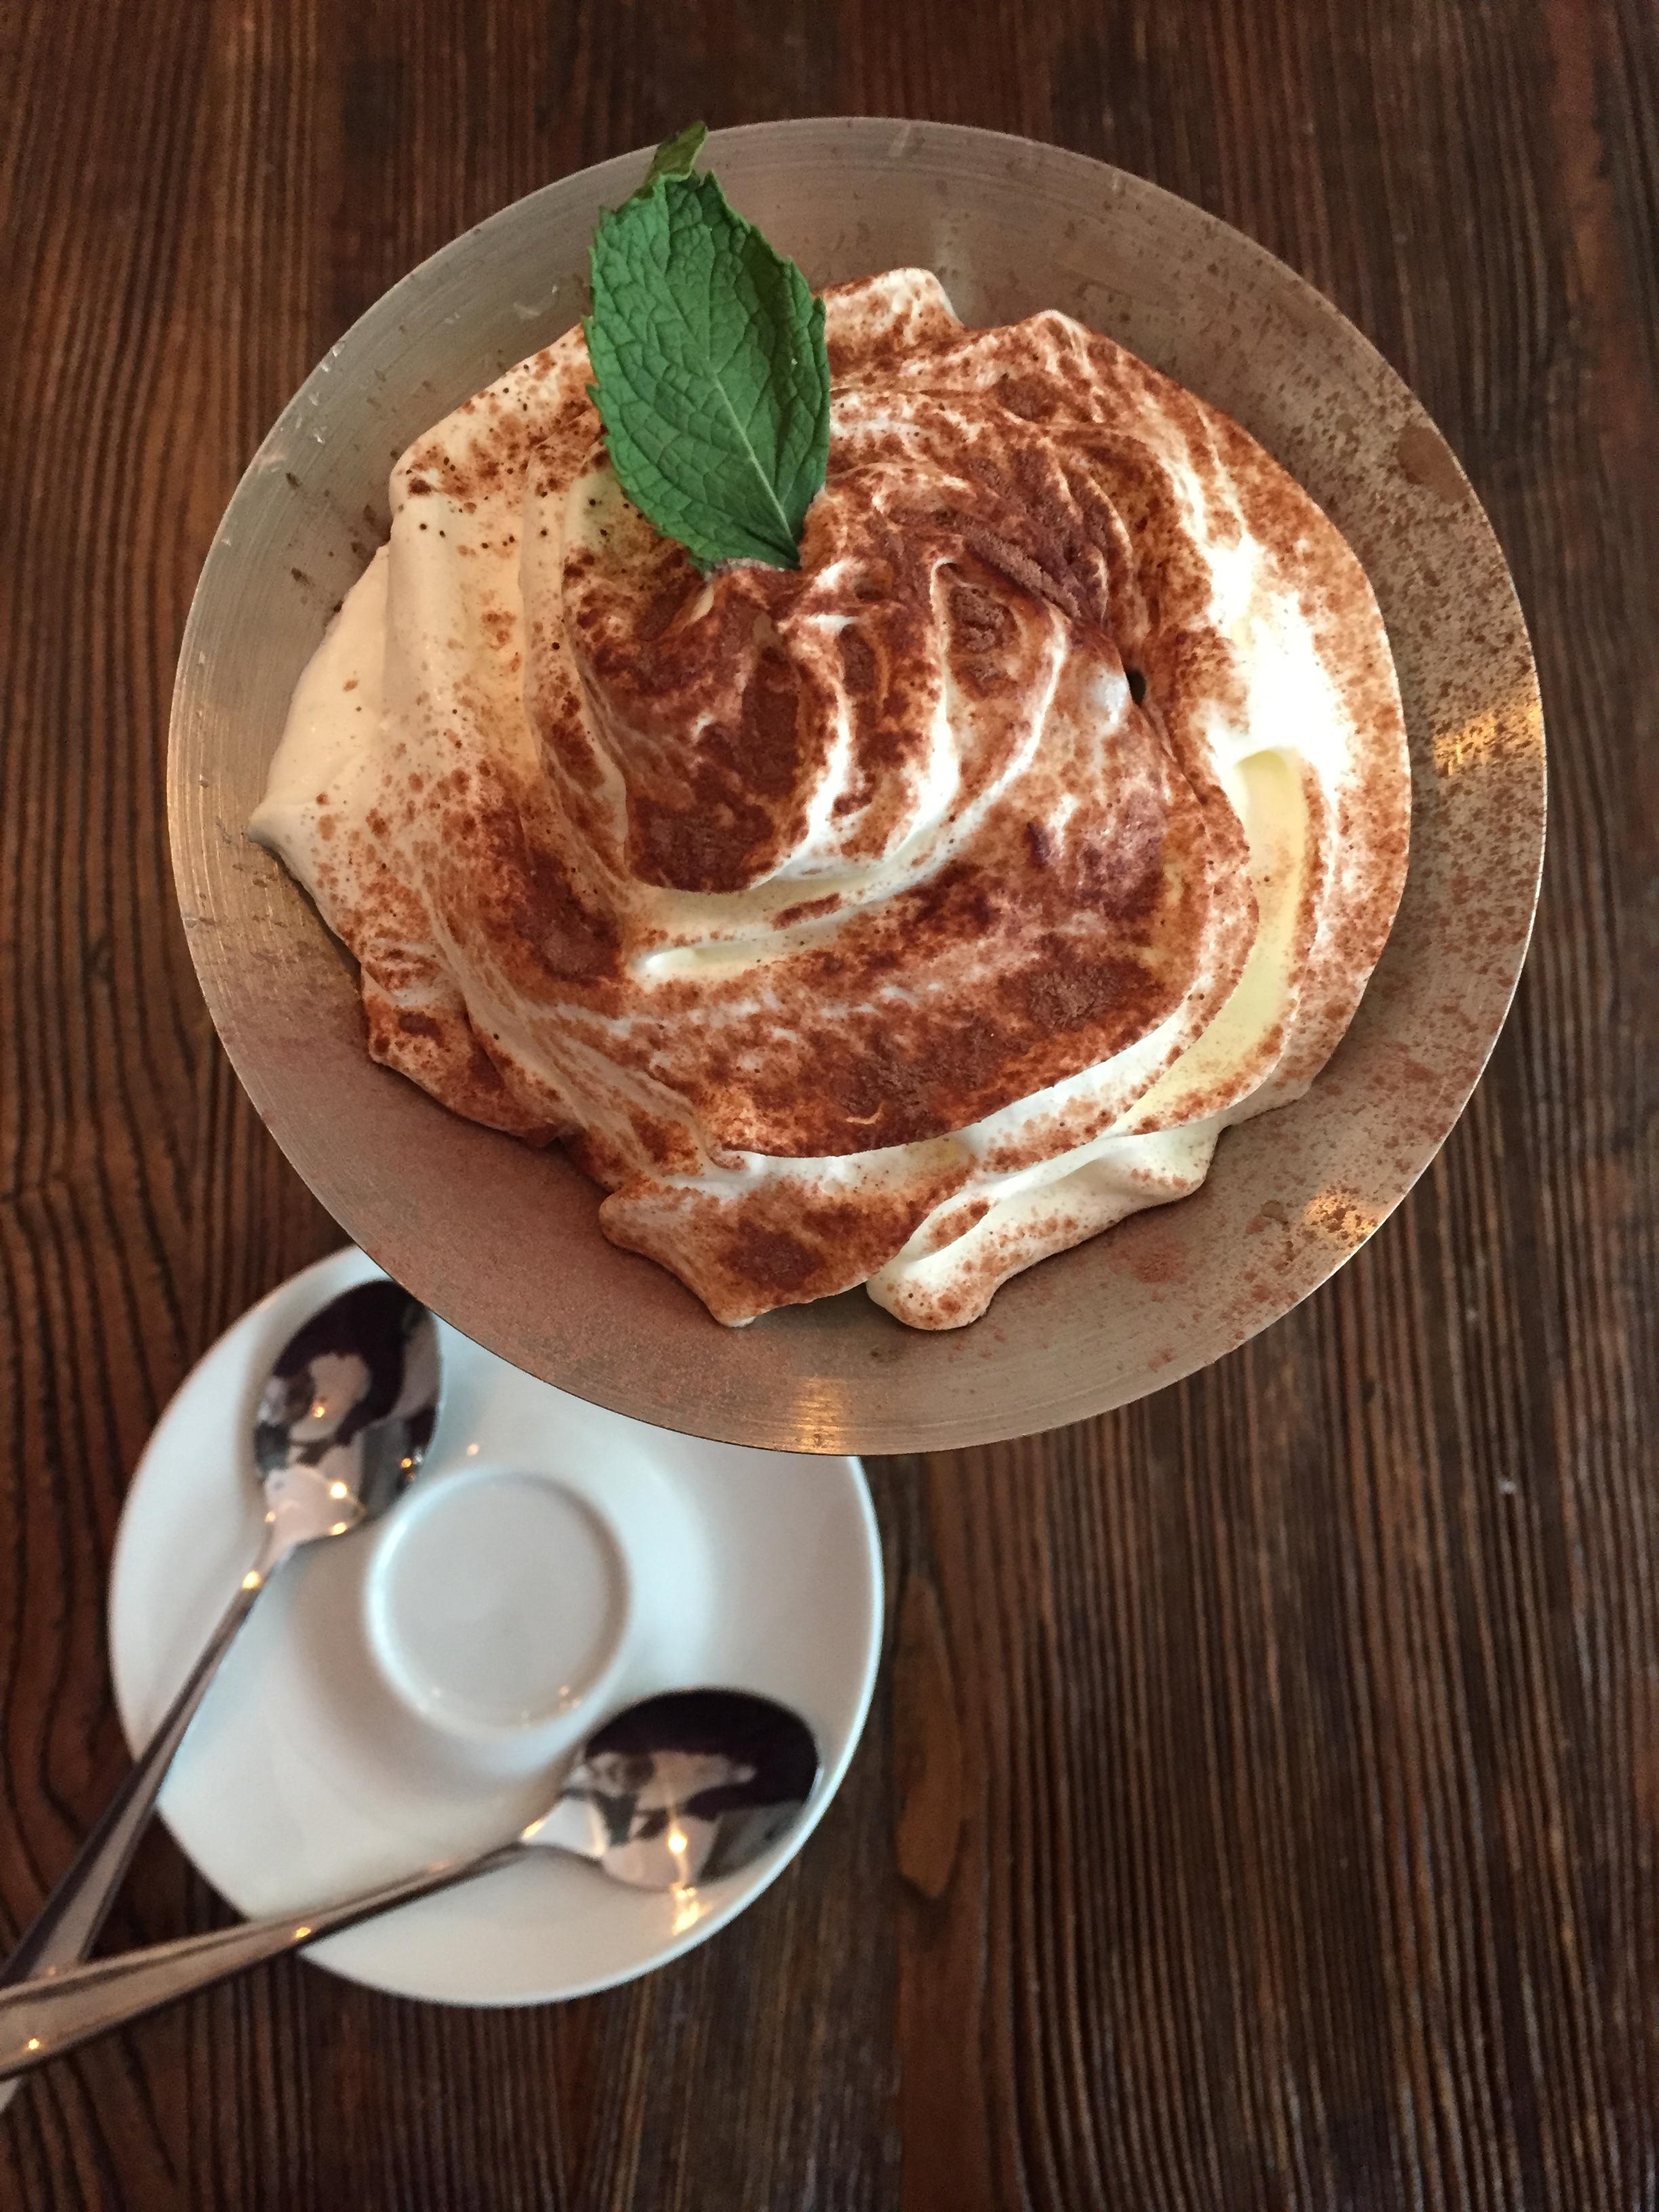 Dessert at B'acino wine bar restaurant